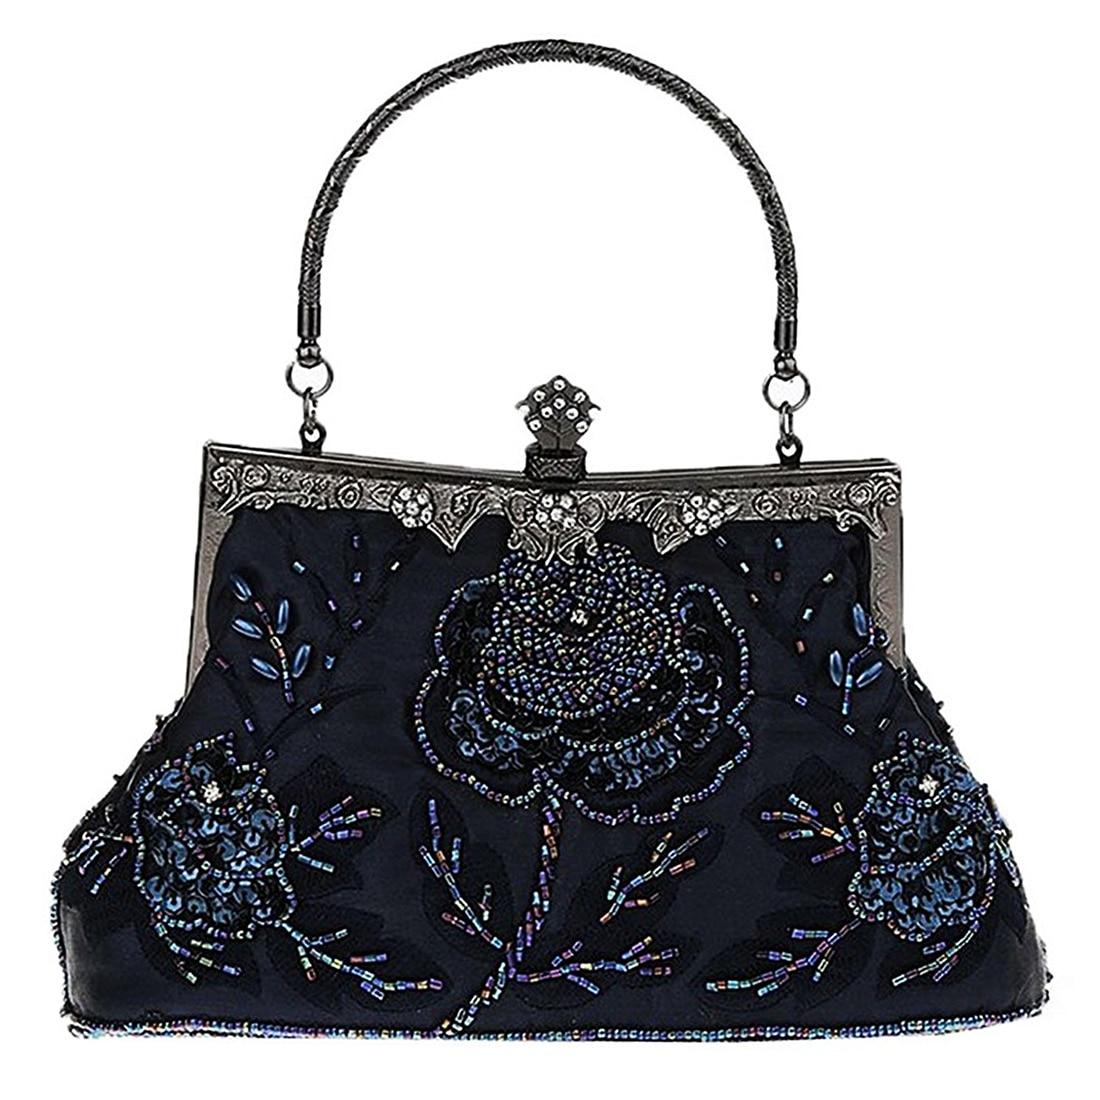 5 pcs of Women Antique Beaded Rose Evening Purse Clutch Handbag,Dark Blue antique rose